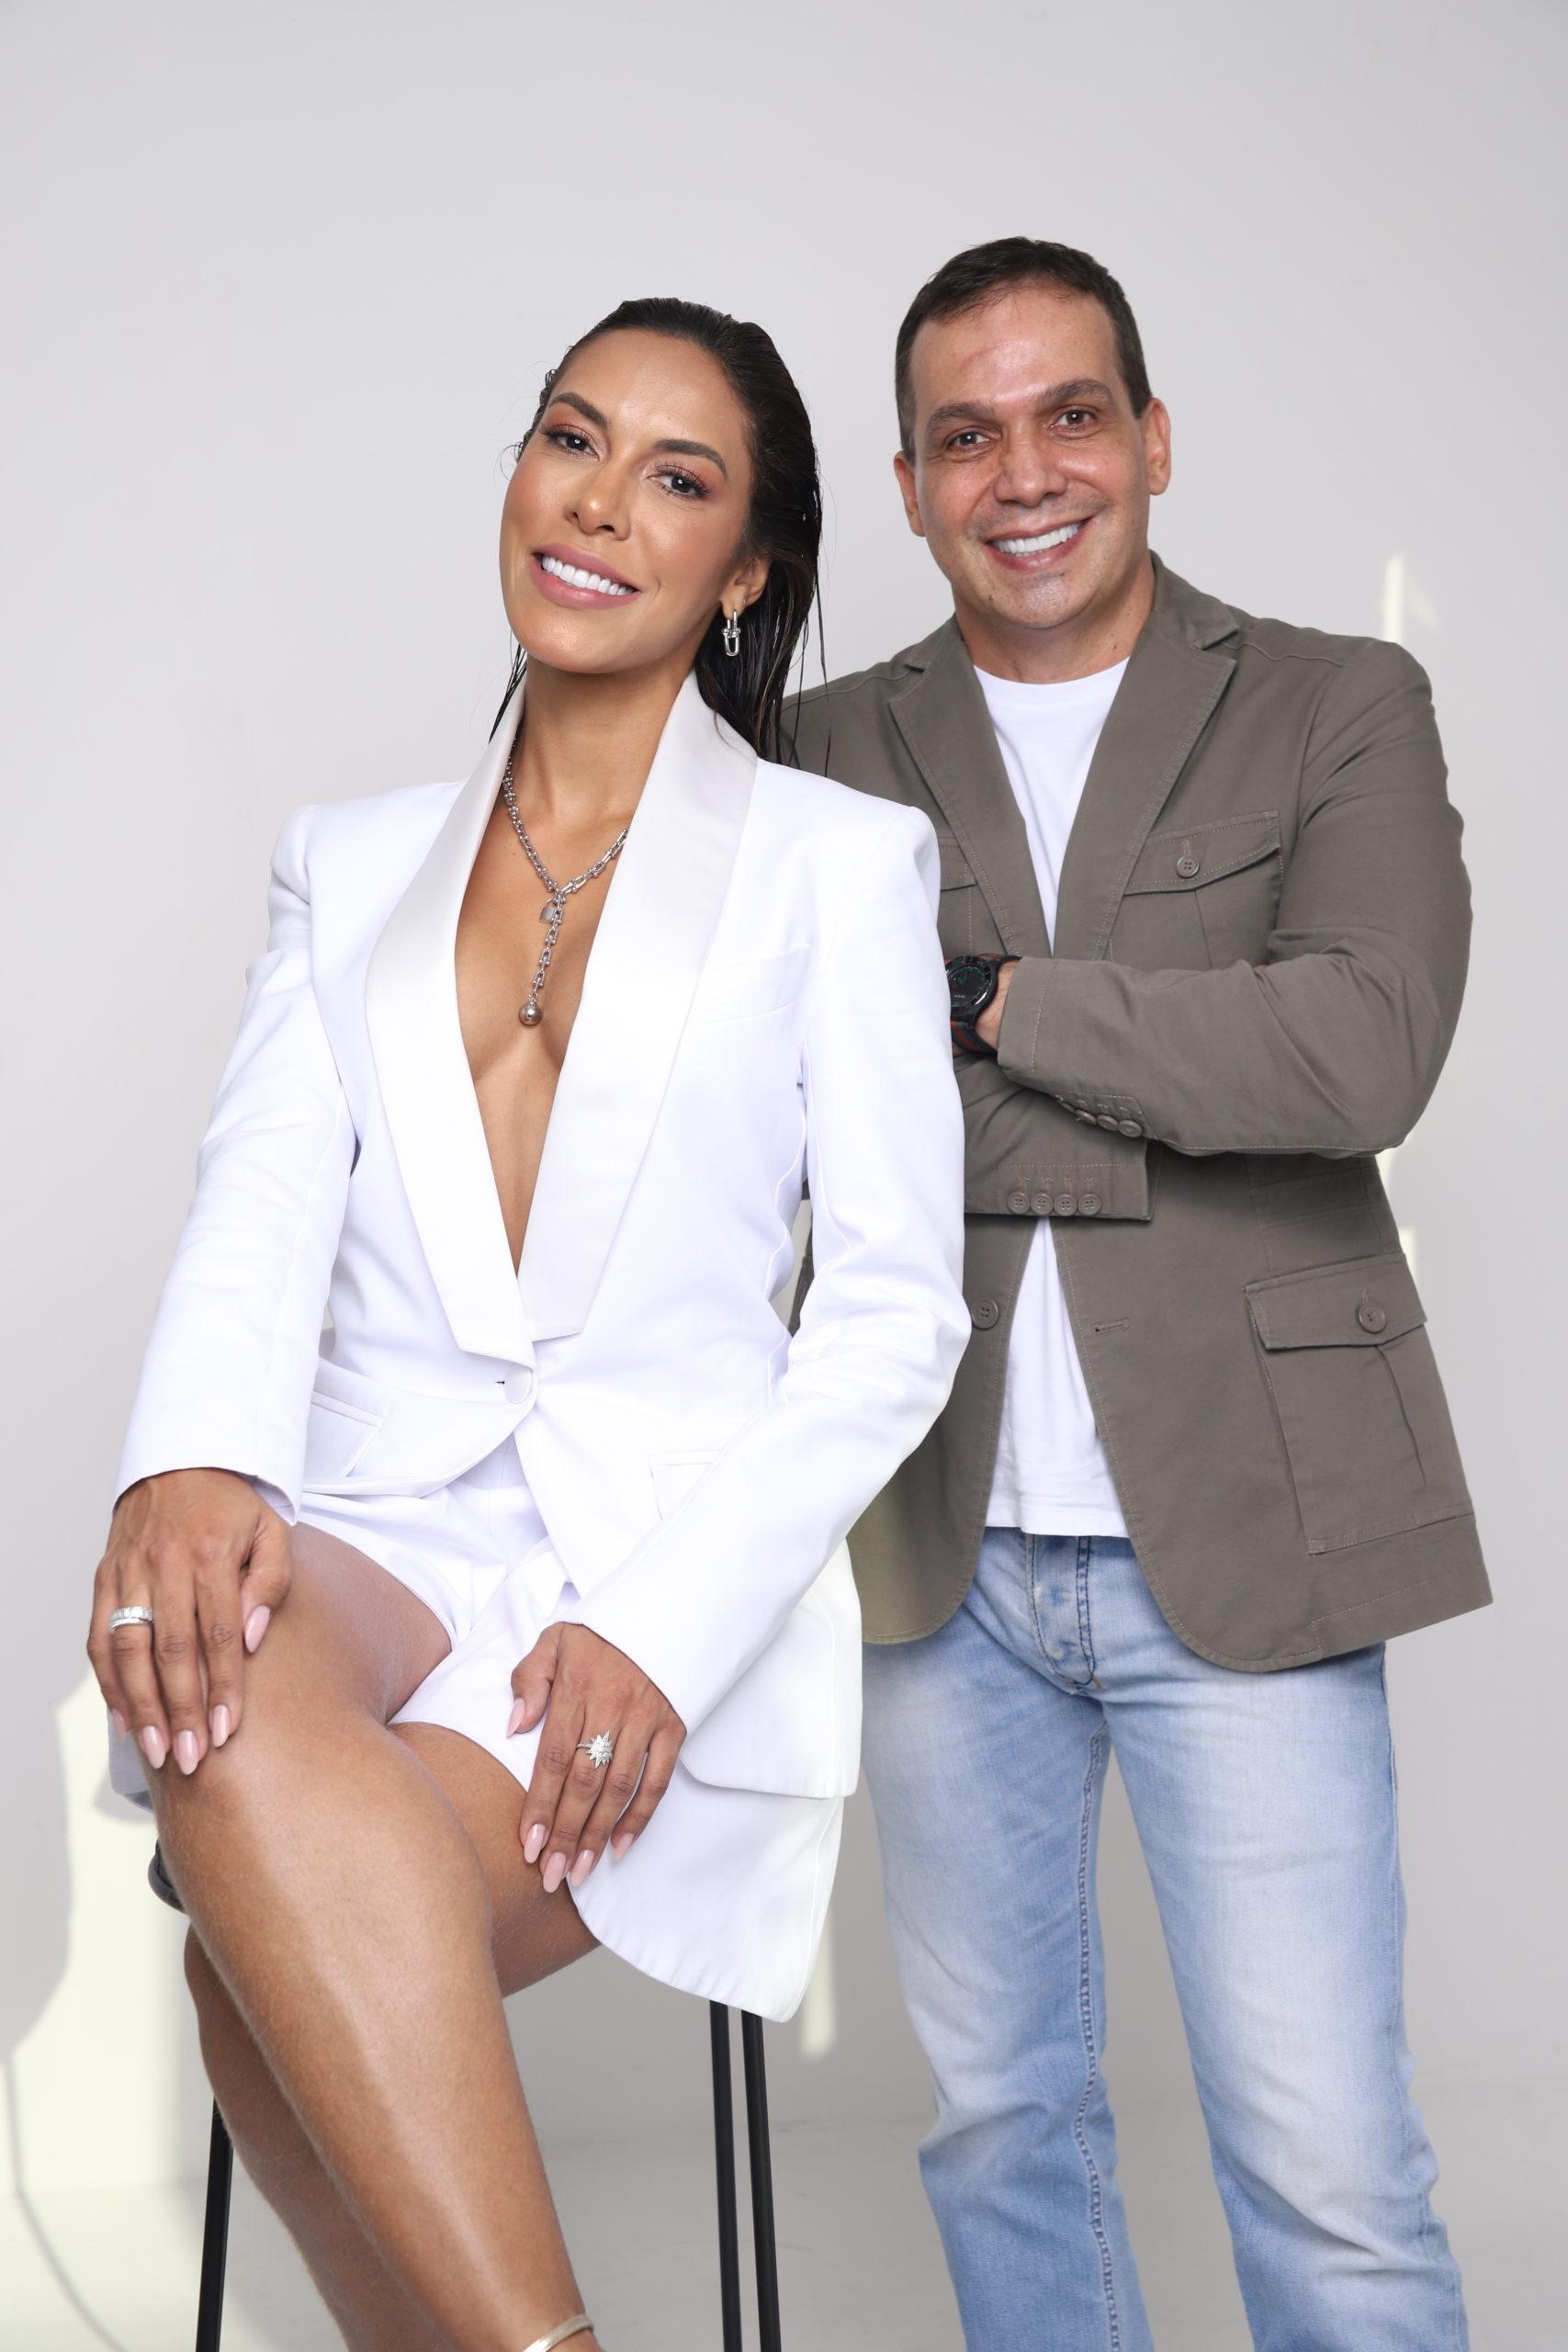 Cibelle Uchoa e Alessandro Junqueira (Lele)